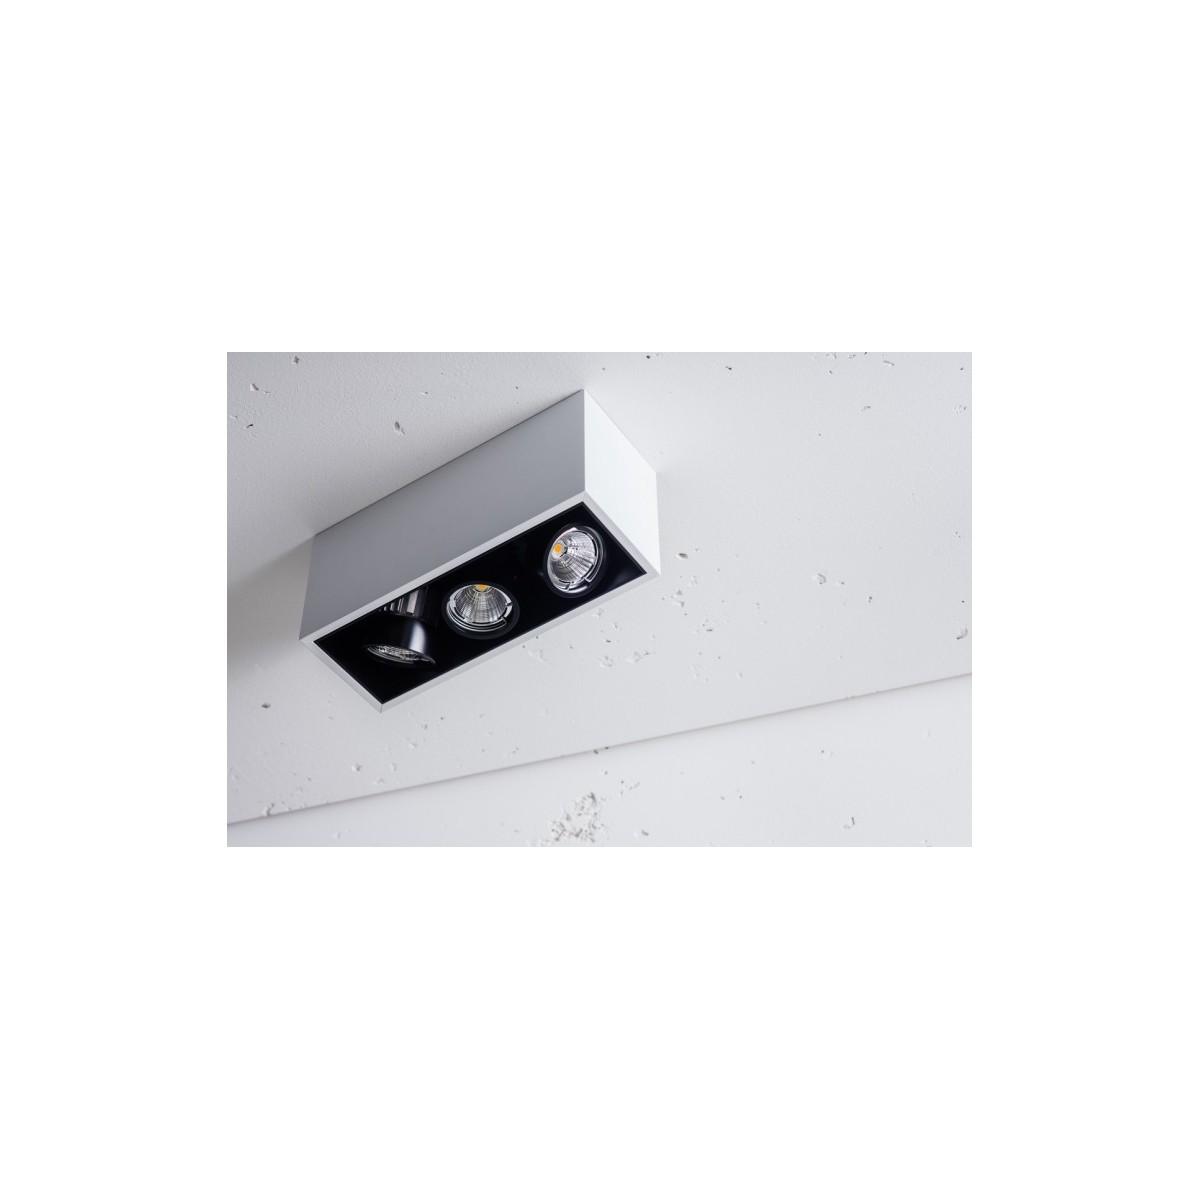 Labra SOLID 110.3 NT LED 3x 5W 3-0702 Sufitowa